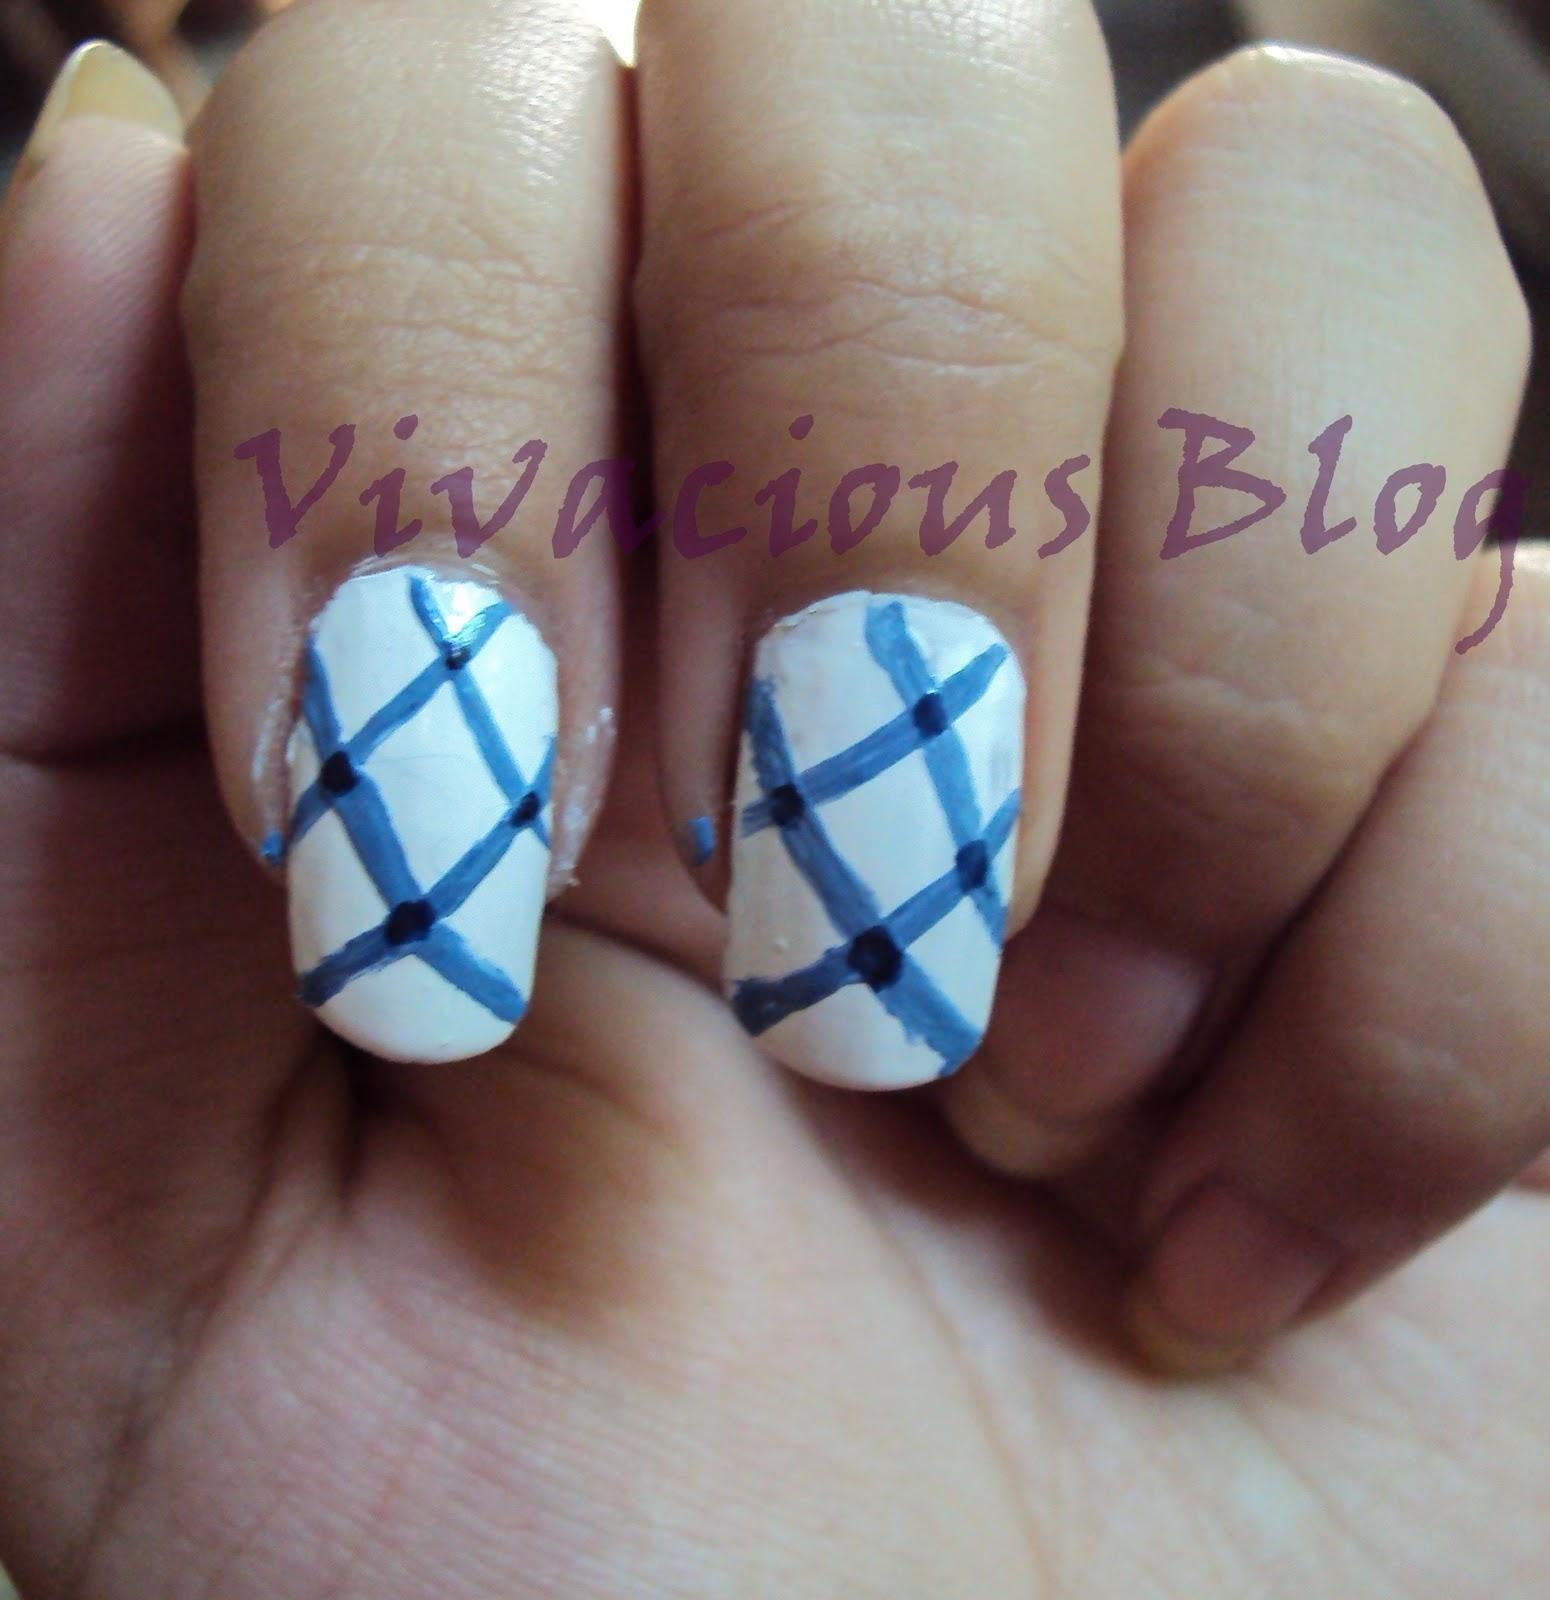 Vivacious Blog Colorful Criss Cross Nail Art